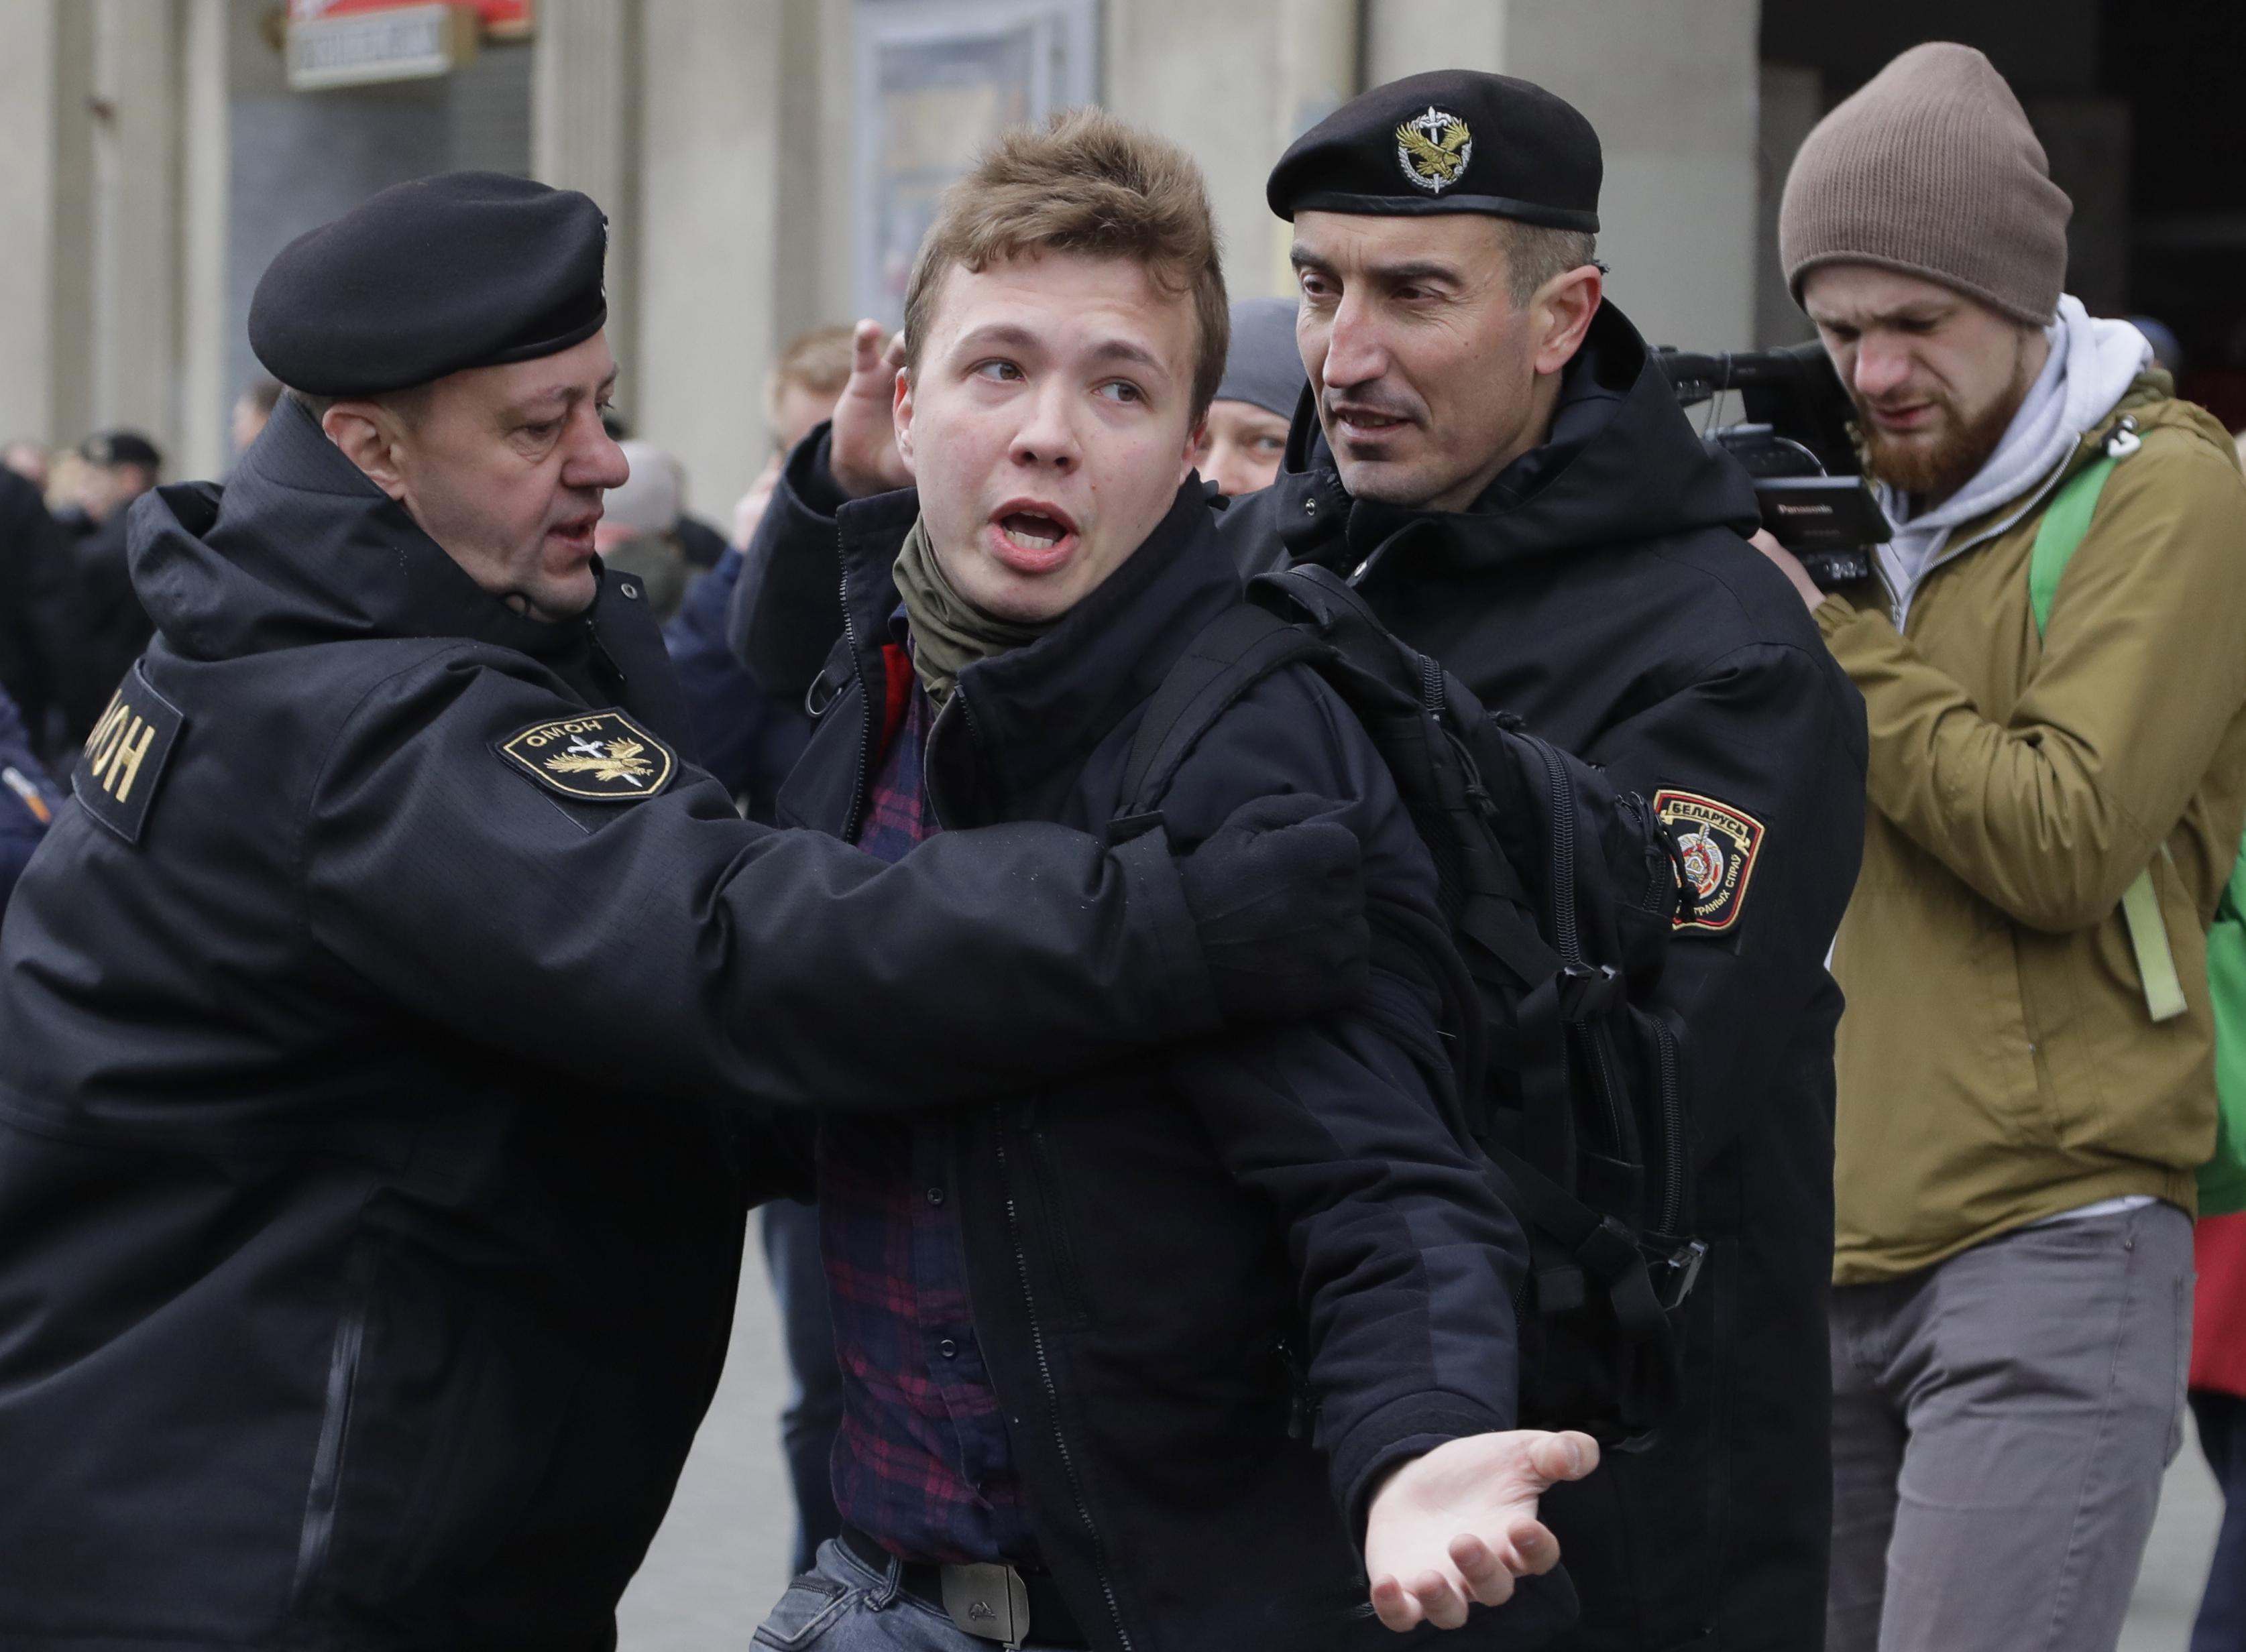 Belarus police detain journalist Raman Pratasevich, center, in Minsk, Belarus, on March 26, 2017.